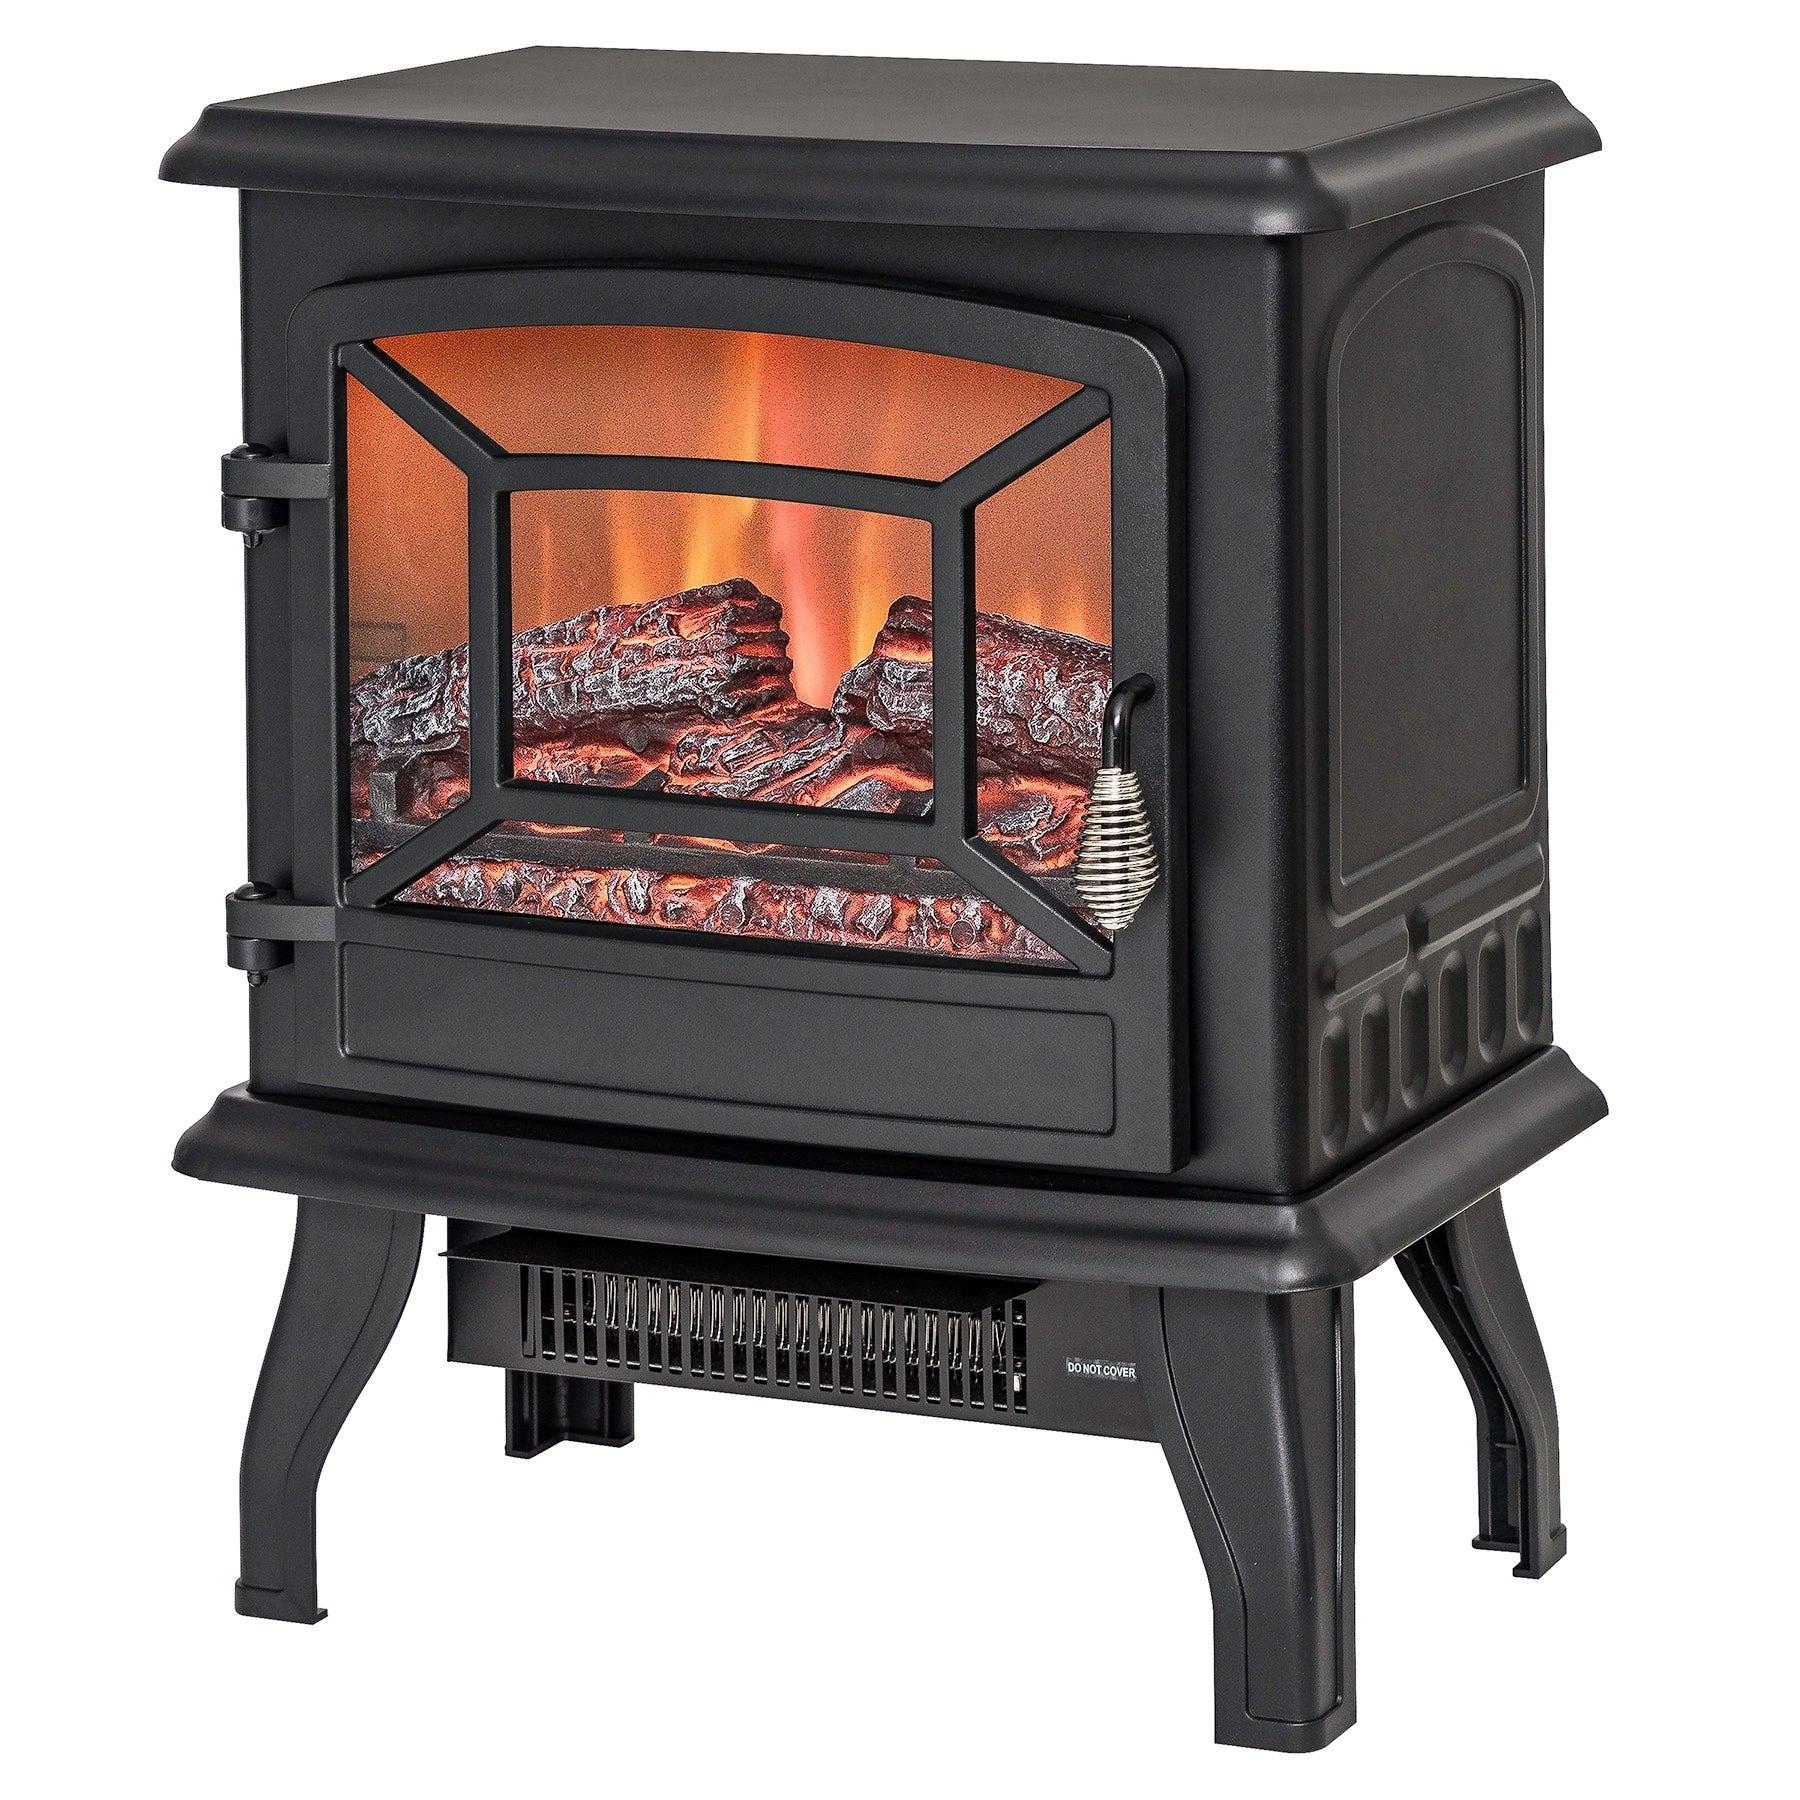 AKDY FP0078 17 Freestanding Portable Electric Fireplace 3D Flames Firebox w Logs Heater f0e0227f c45e 4d8a 80d4 a25b dd